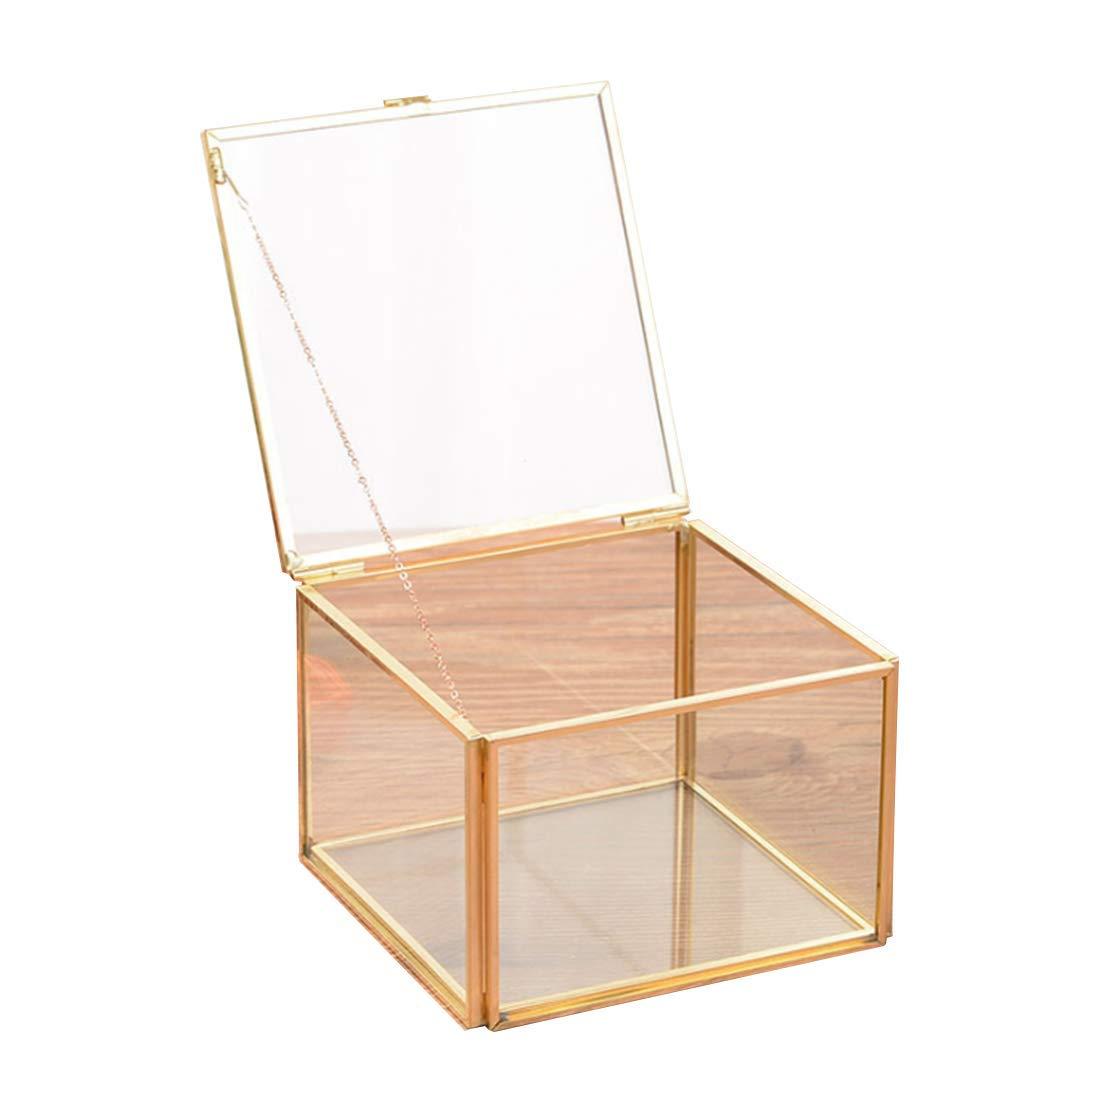 Geometric Micro Landscape Plant Glass Flower Room European Creative Polygon Jewelry Storage Box (Square)